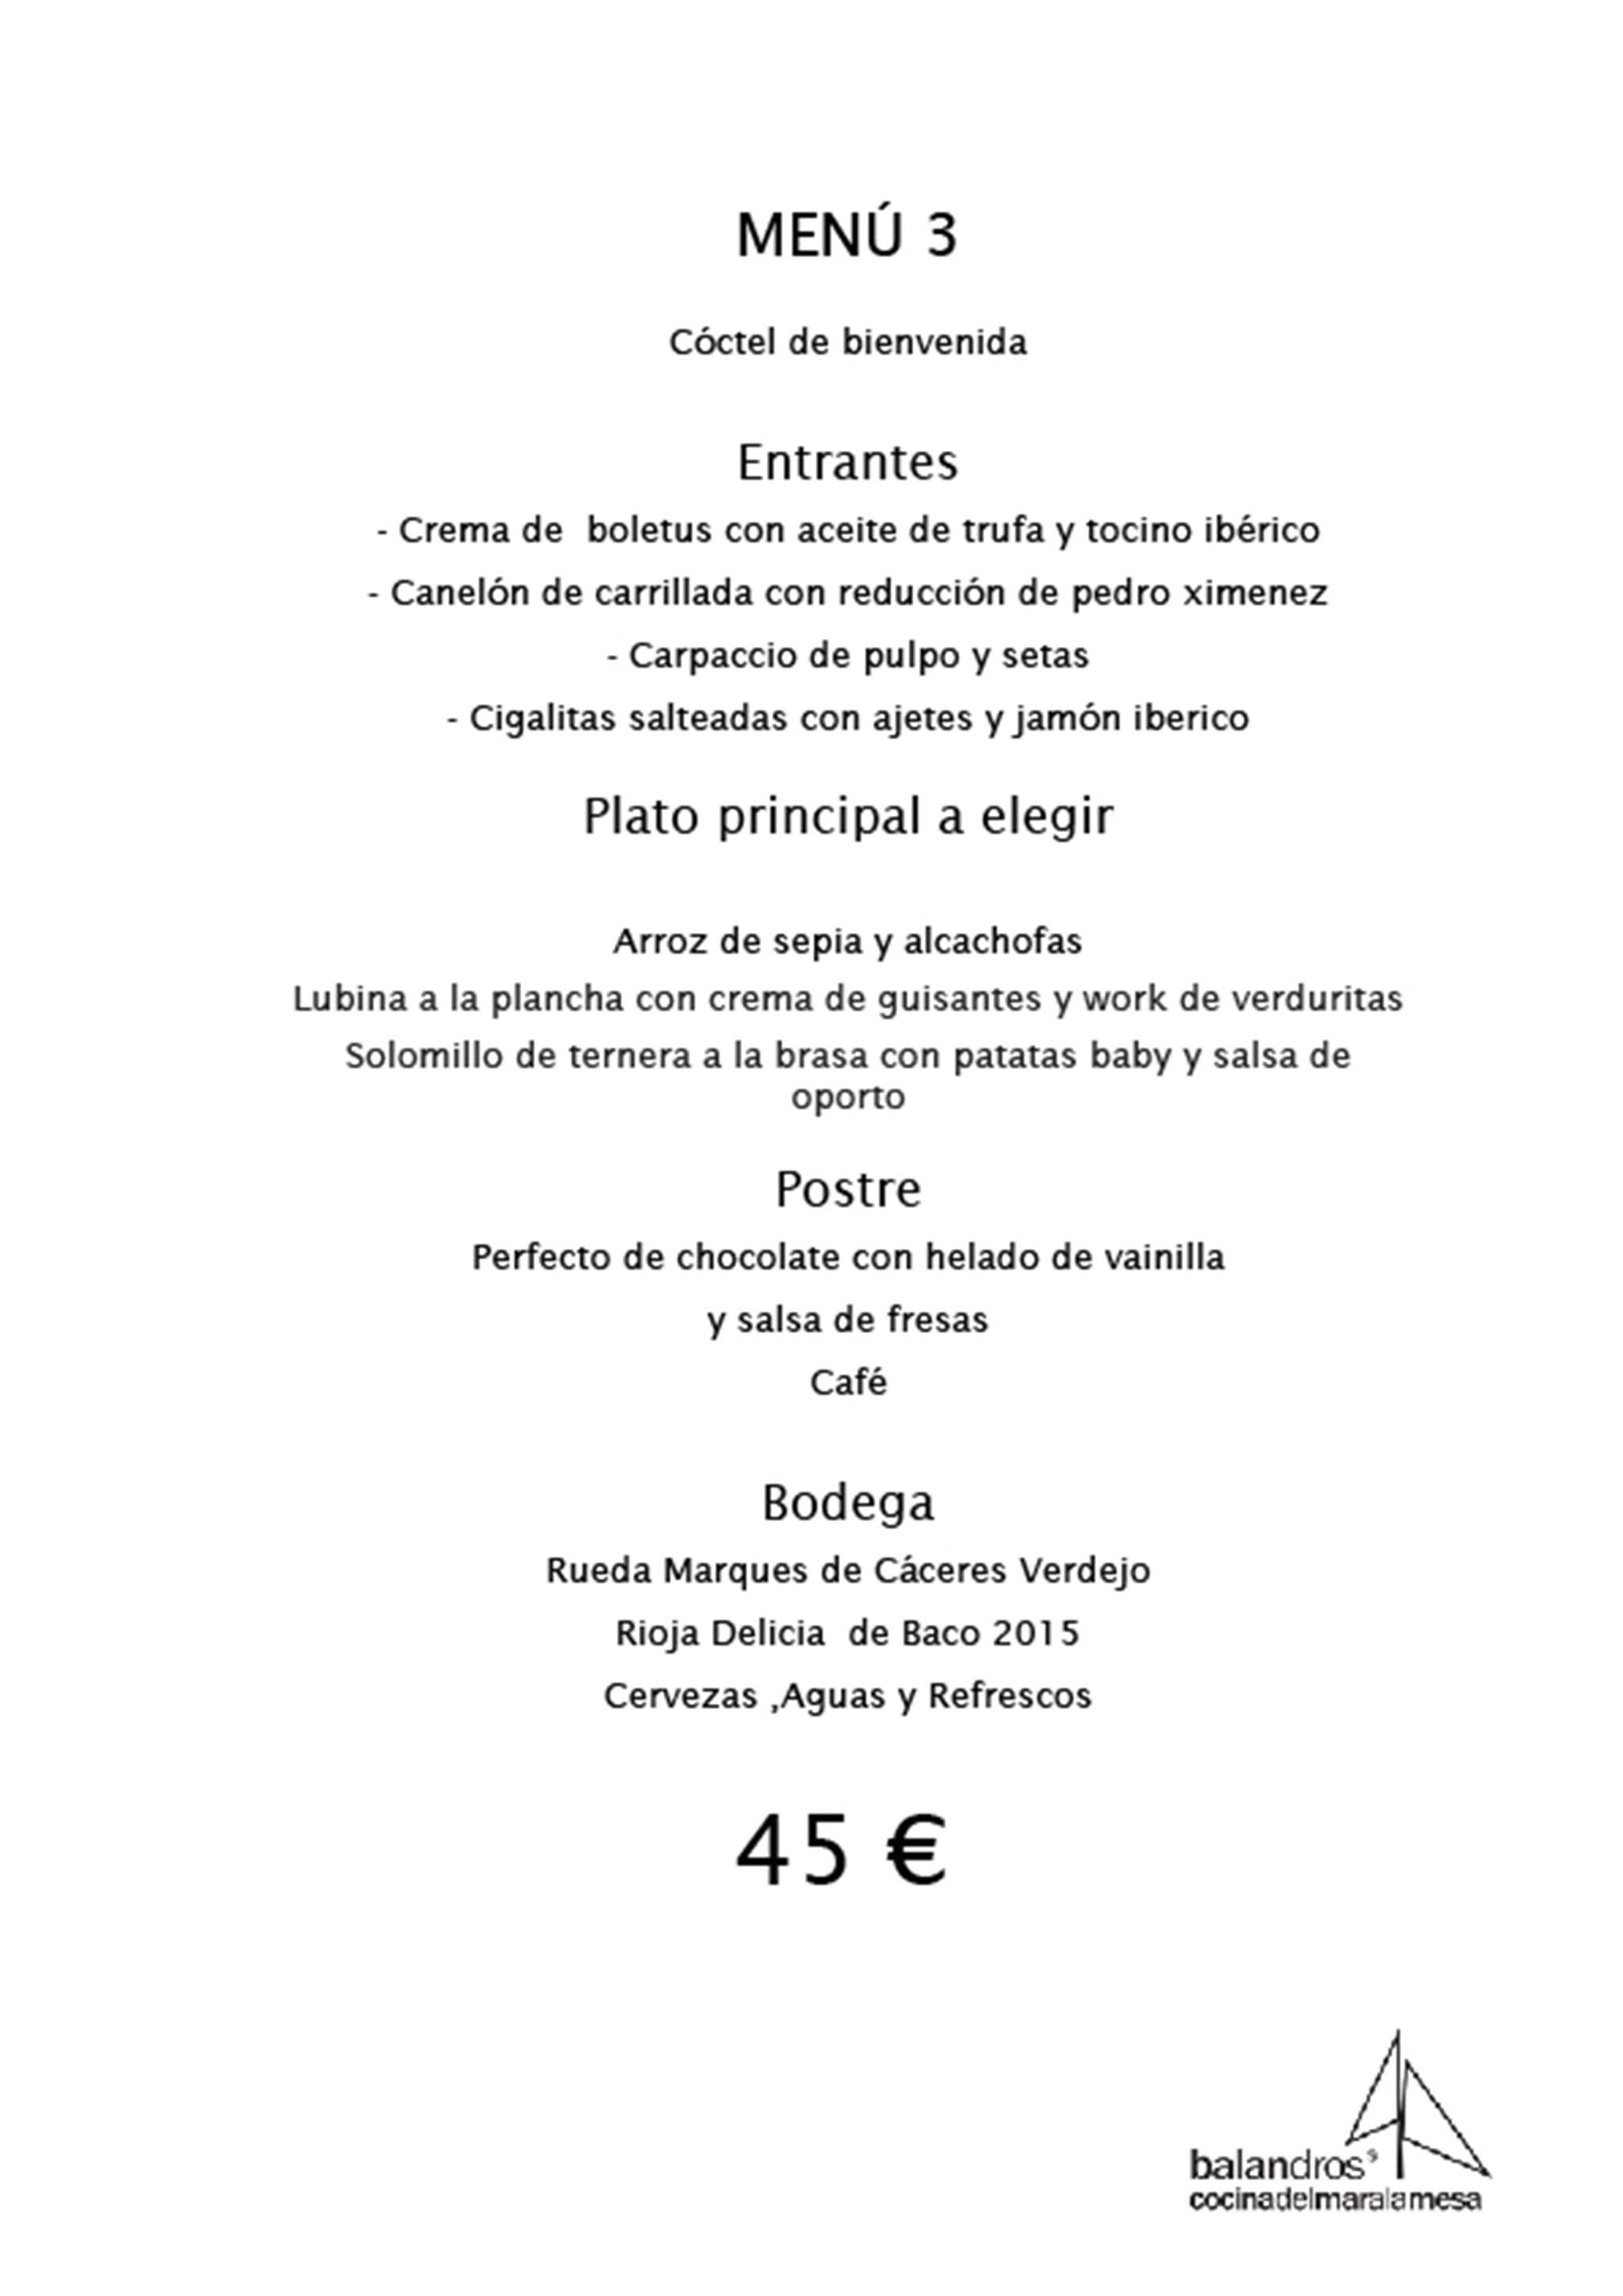 Menú de empresa por 45€ – Restaurante Balandros